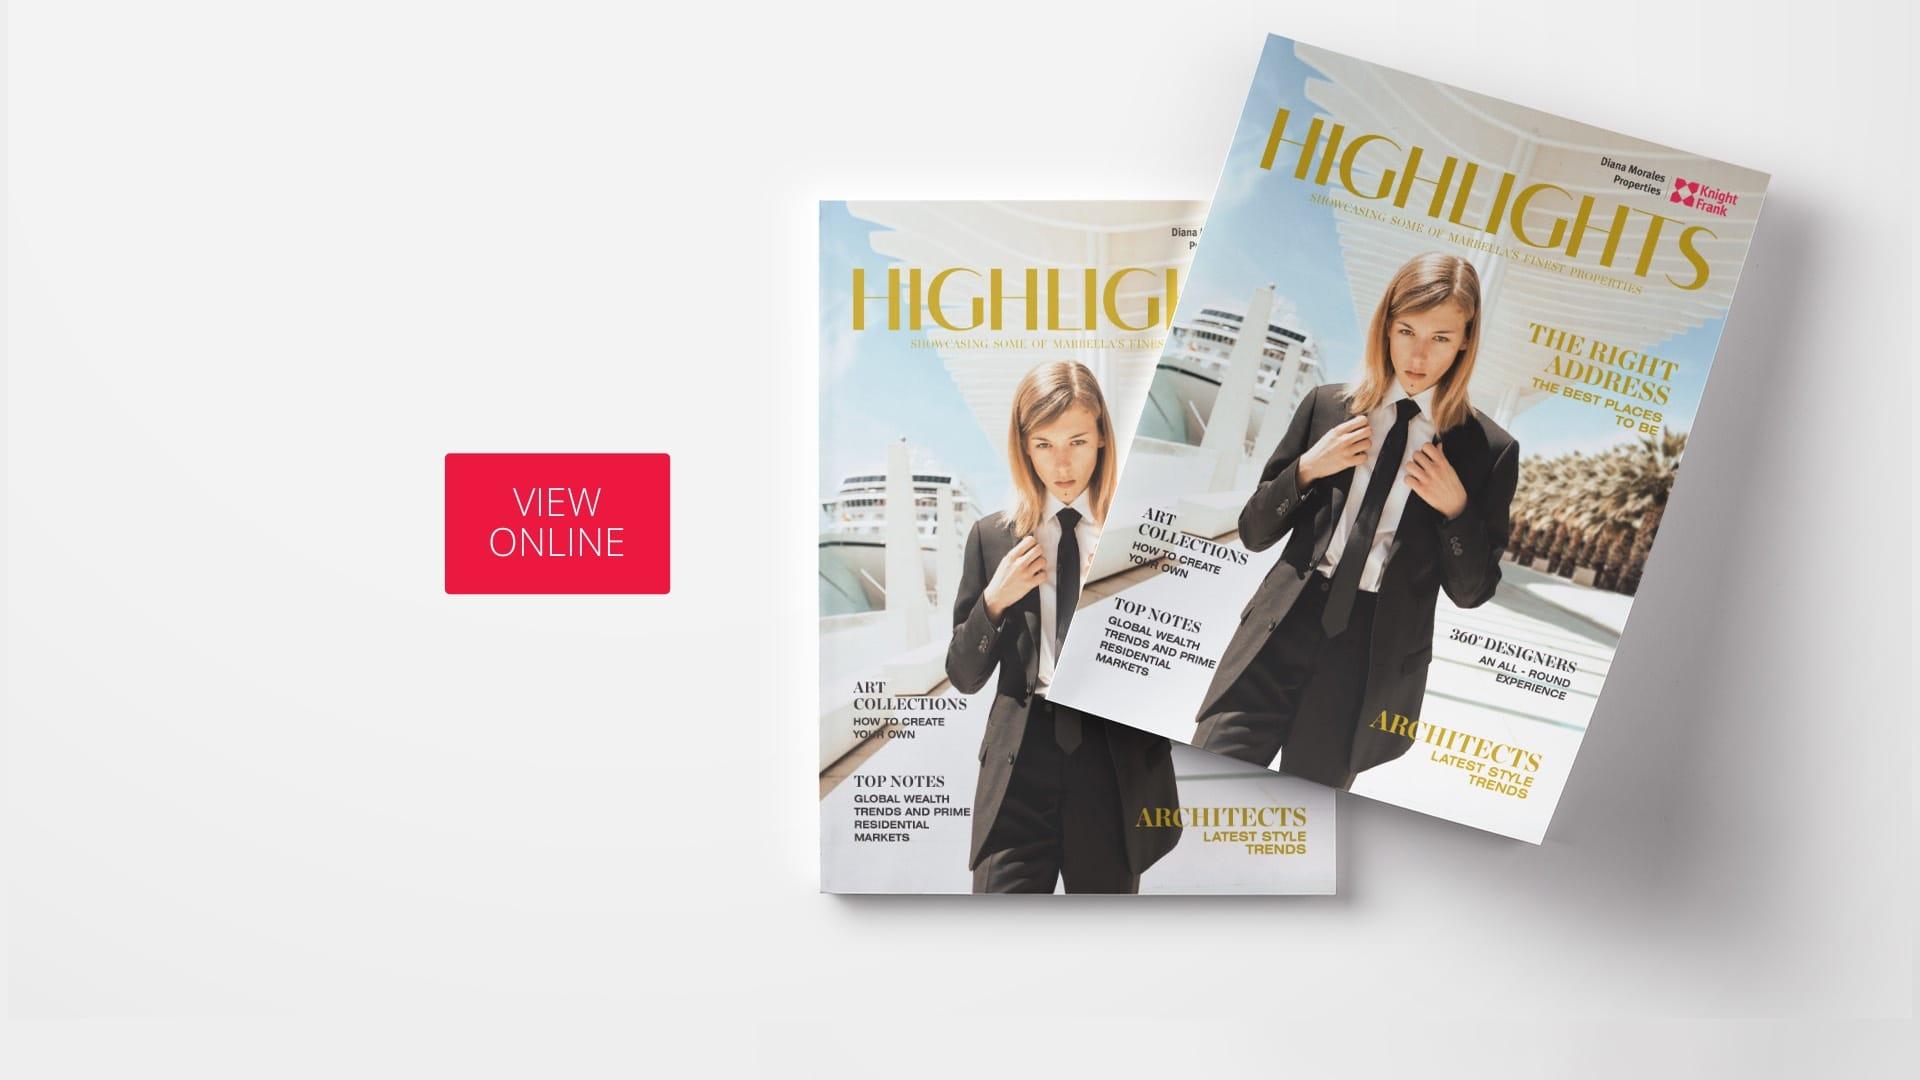 Entladen Highlights  online